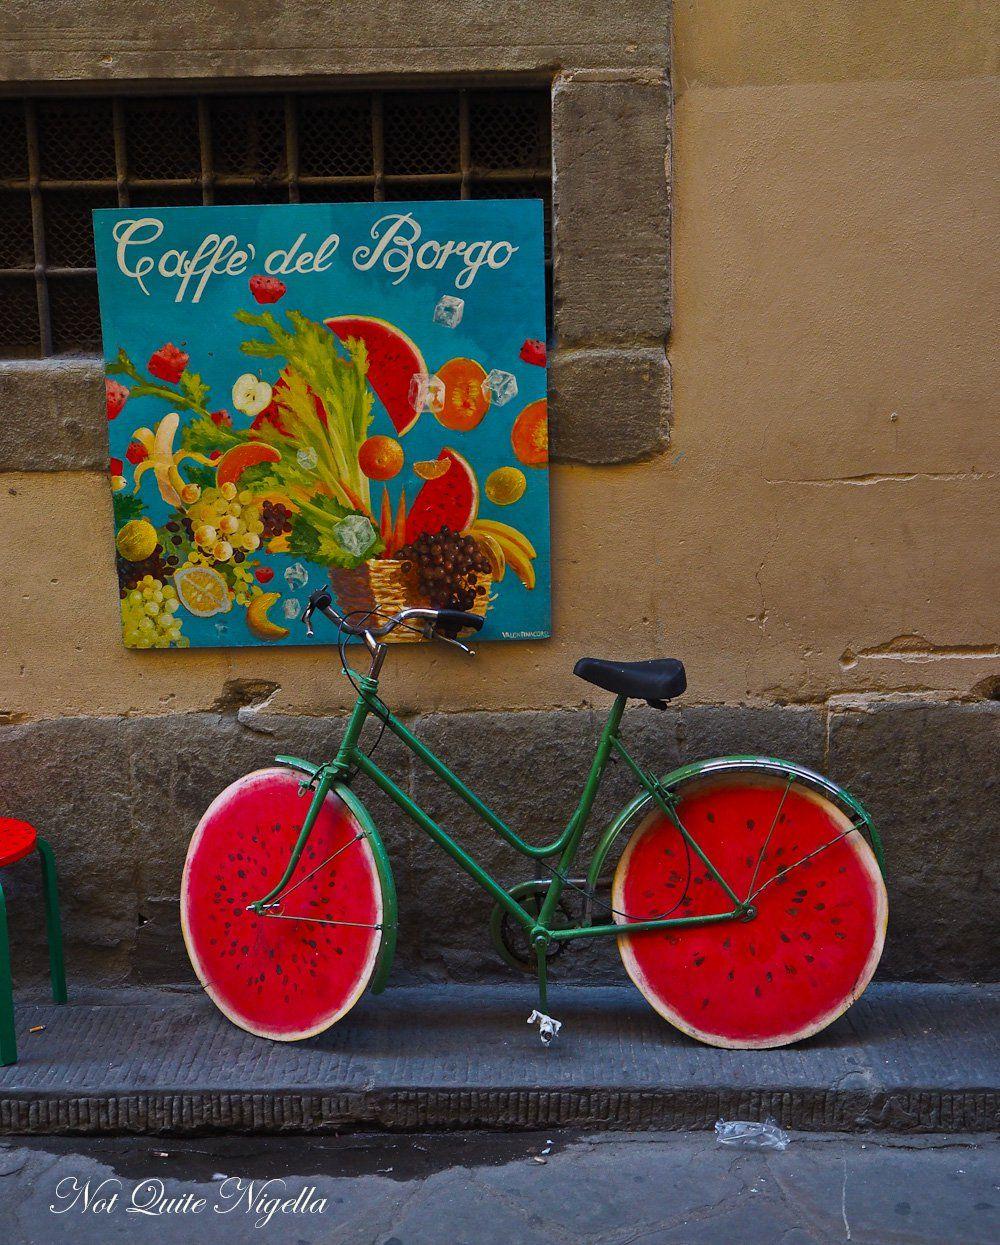 Pin By Kinga Size On Bikes Fahrrad Florence Tuscany Food Italy